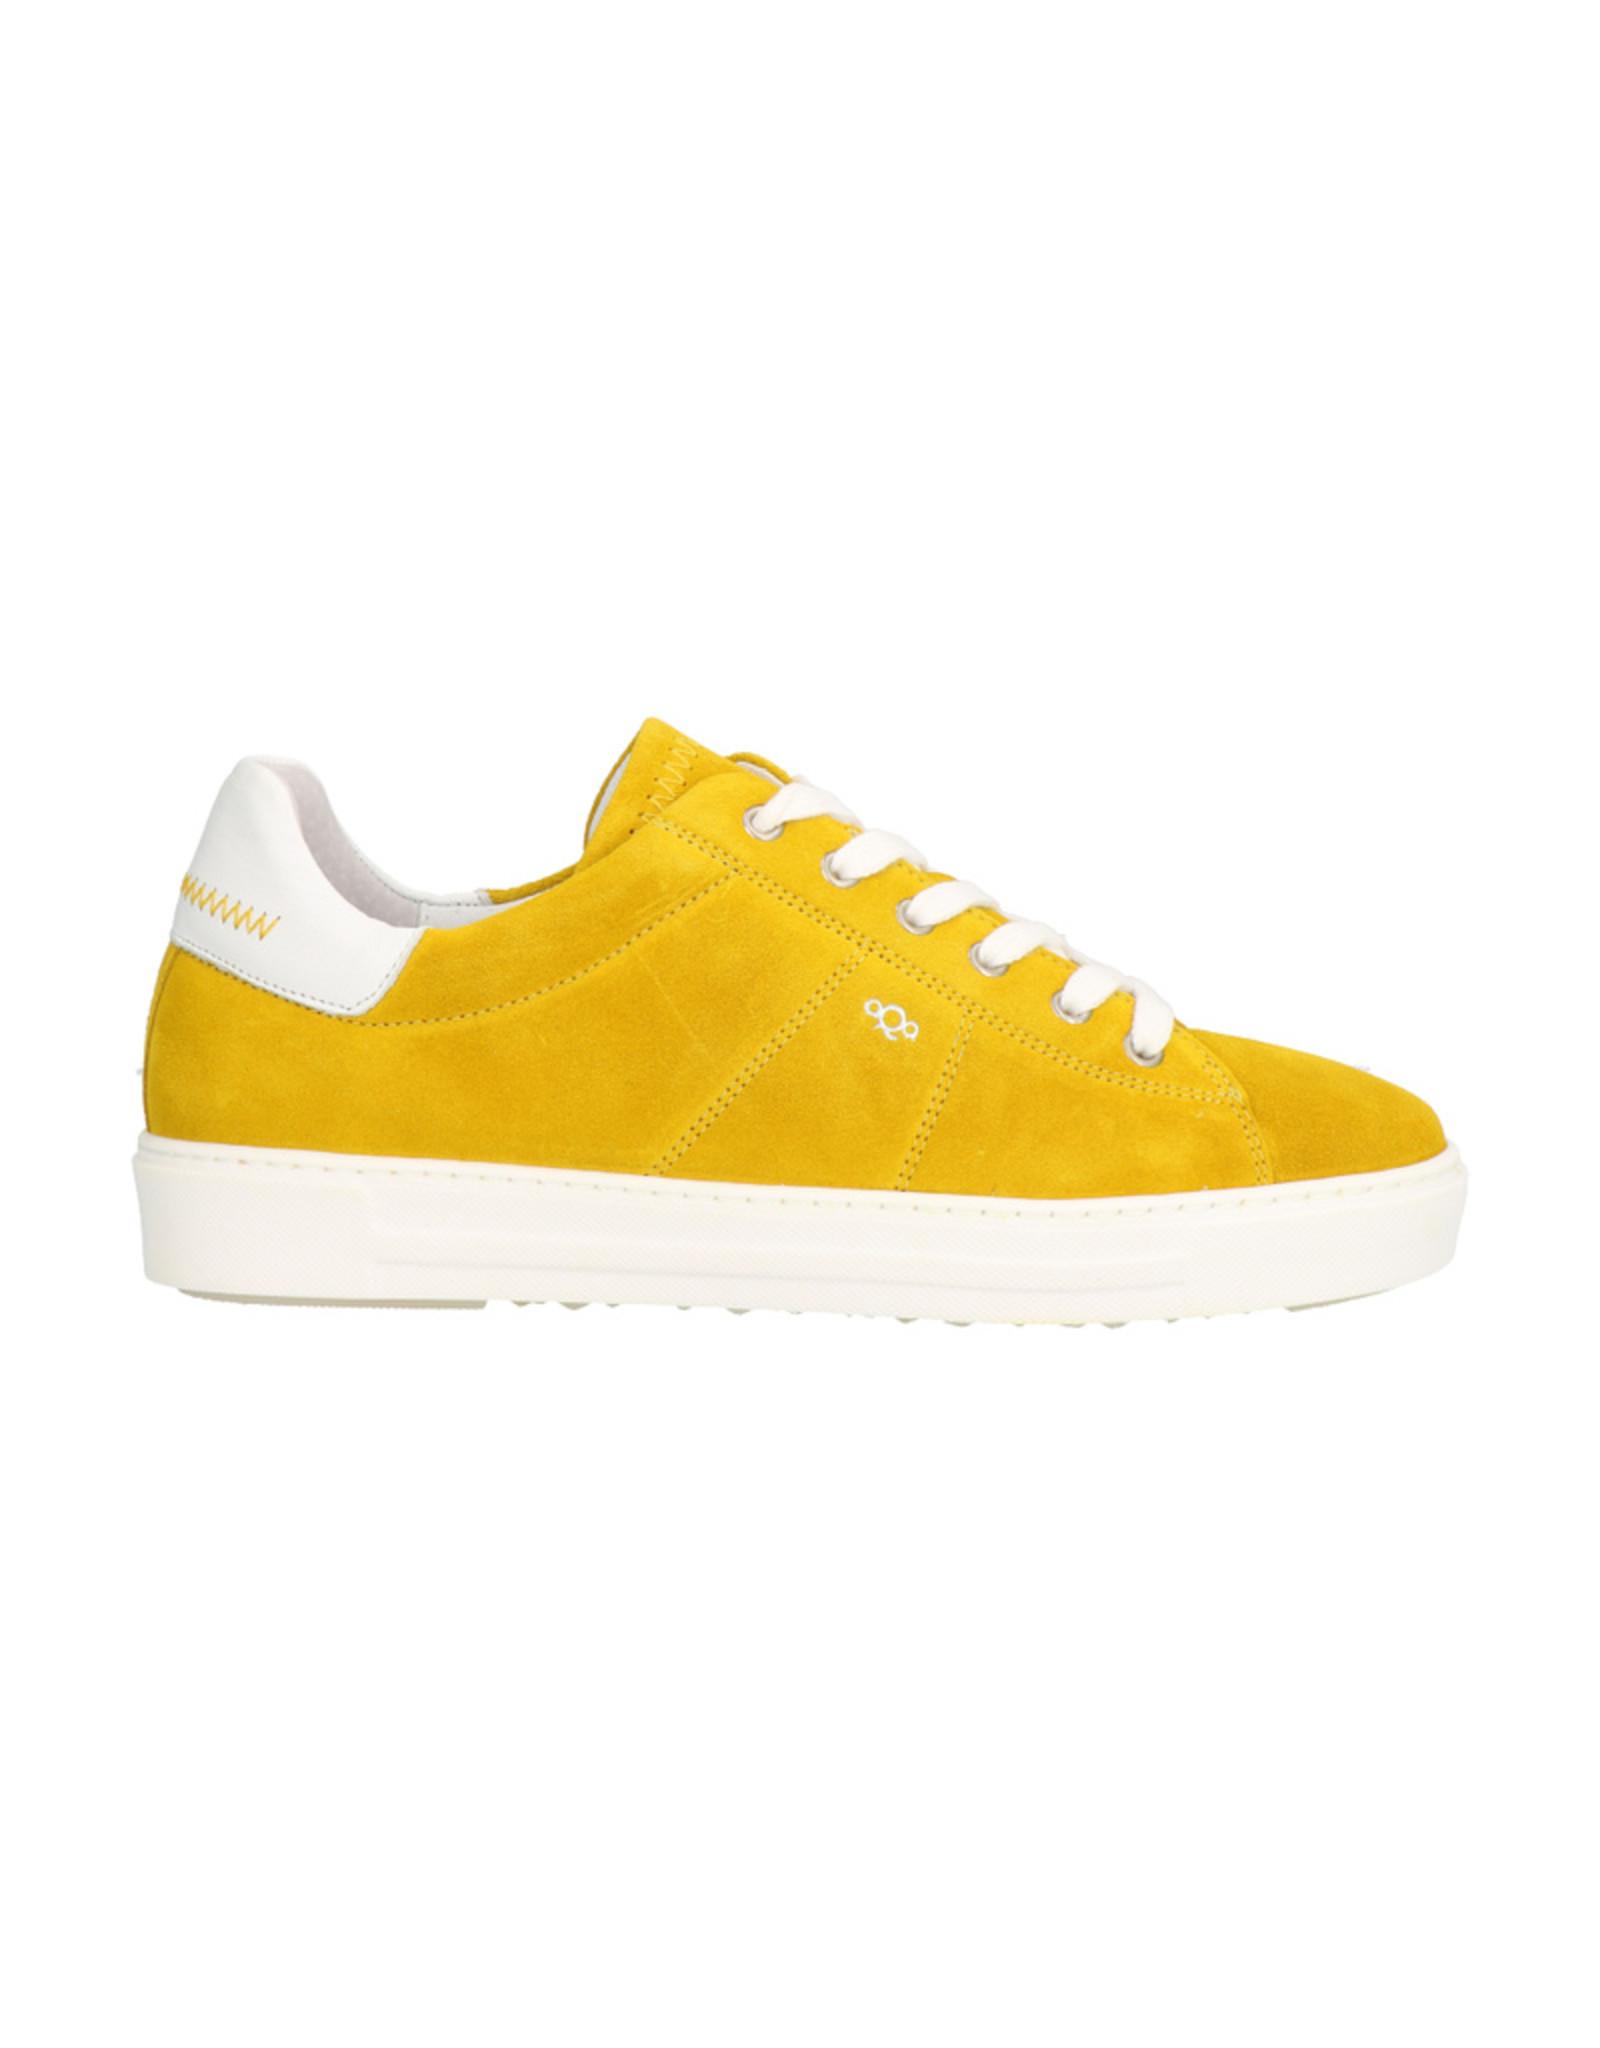 aqa A7201 F13 A11 Yellow